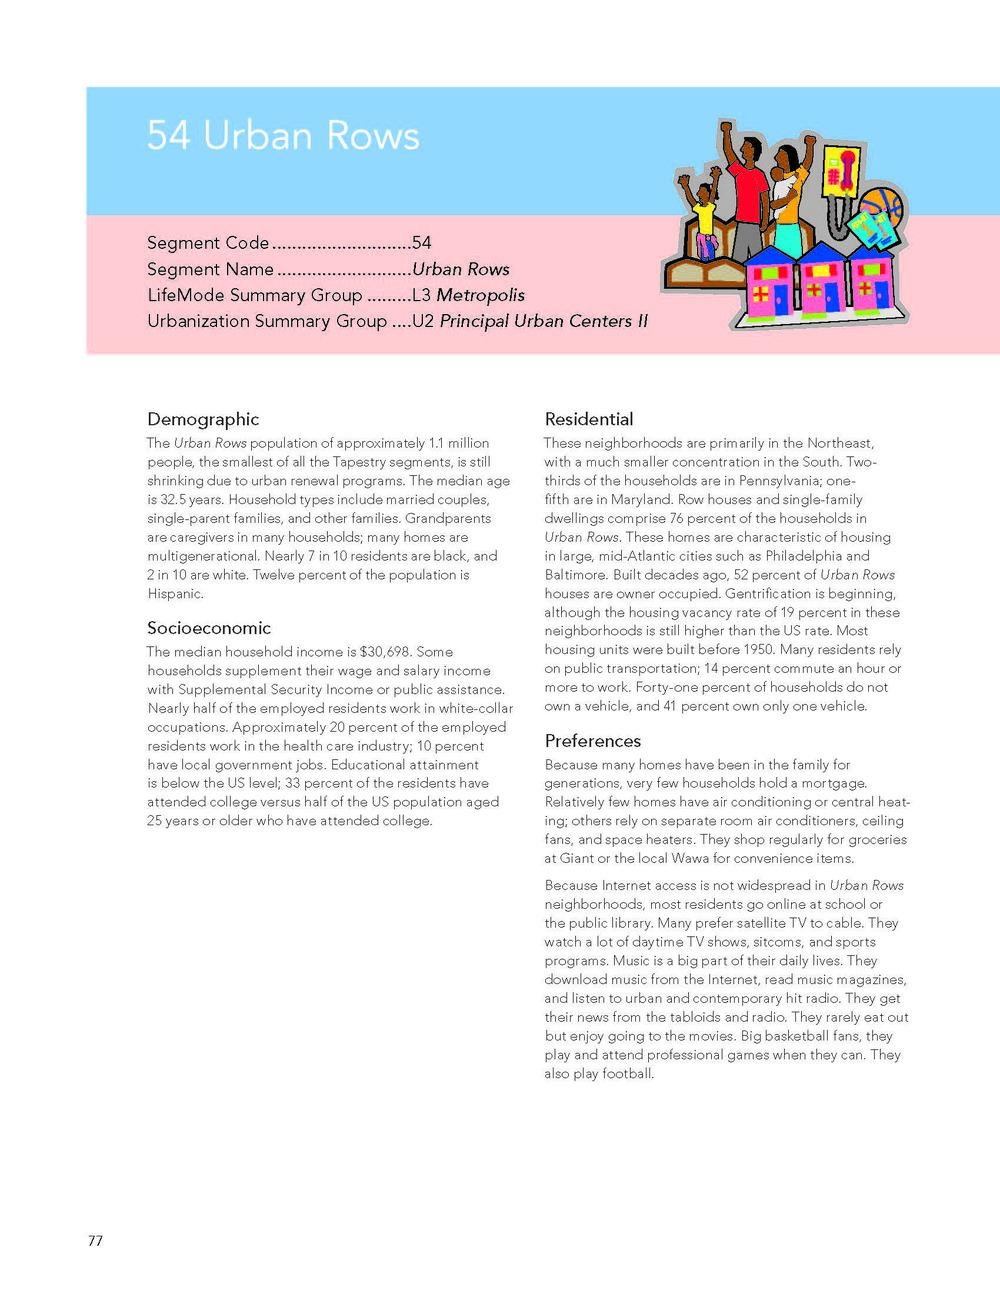 tapestry-segmentation_Page_80.jpg